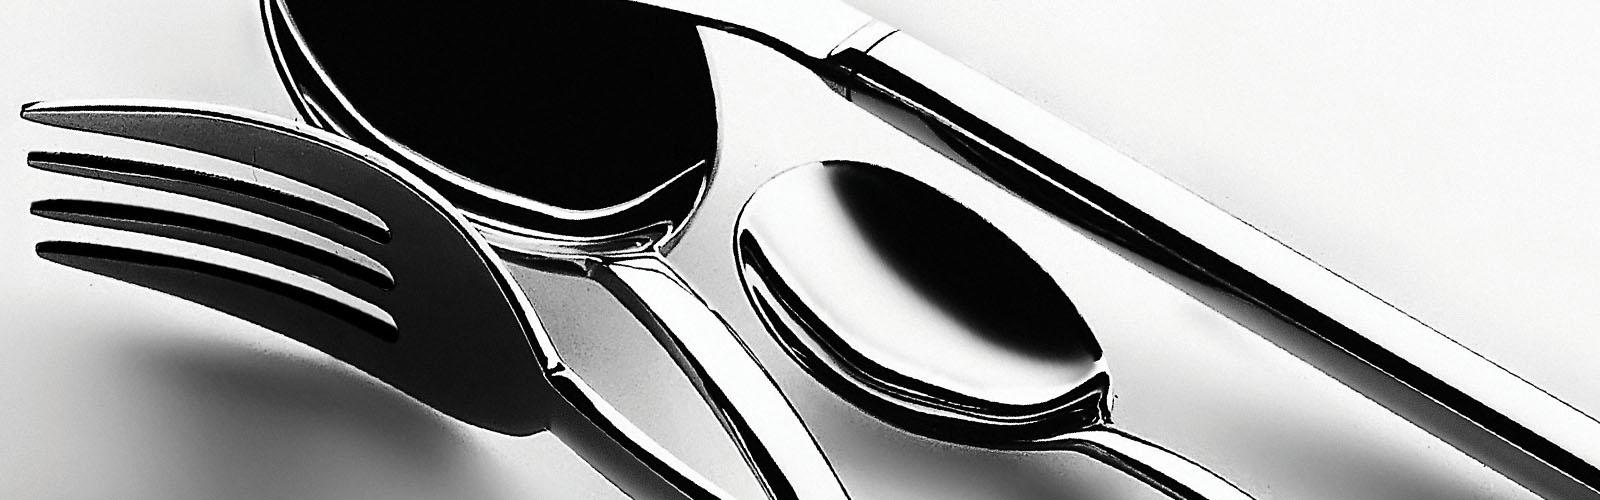 Posate design in acciaio made in italy mepra s p a - Casalinghi design ...